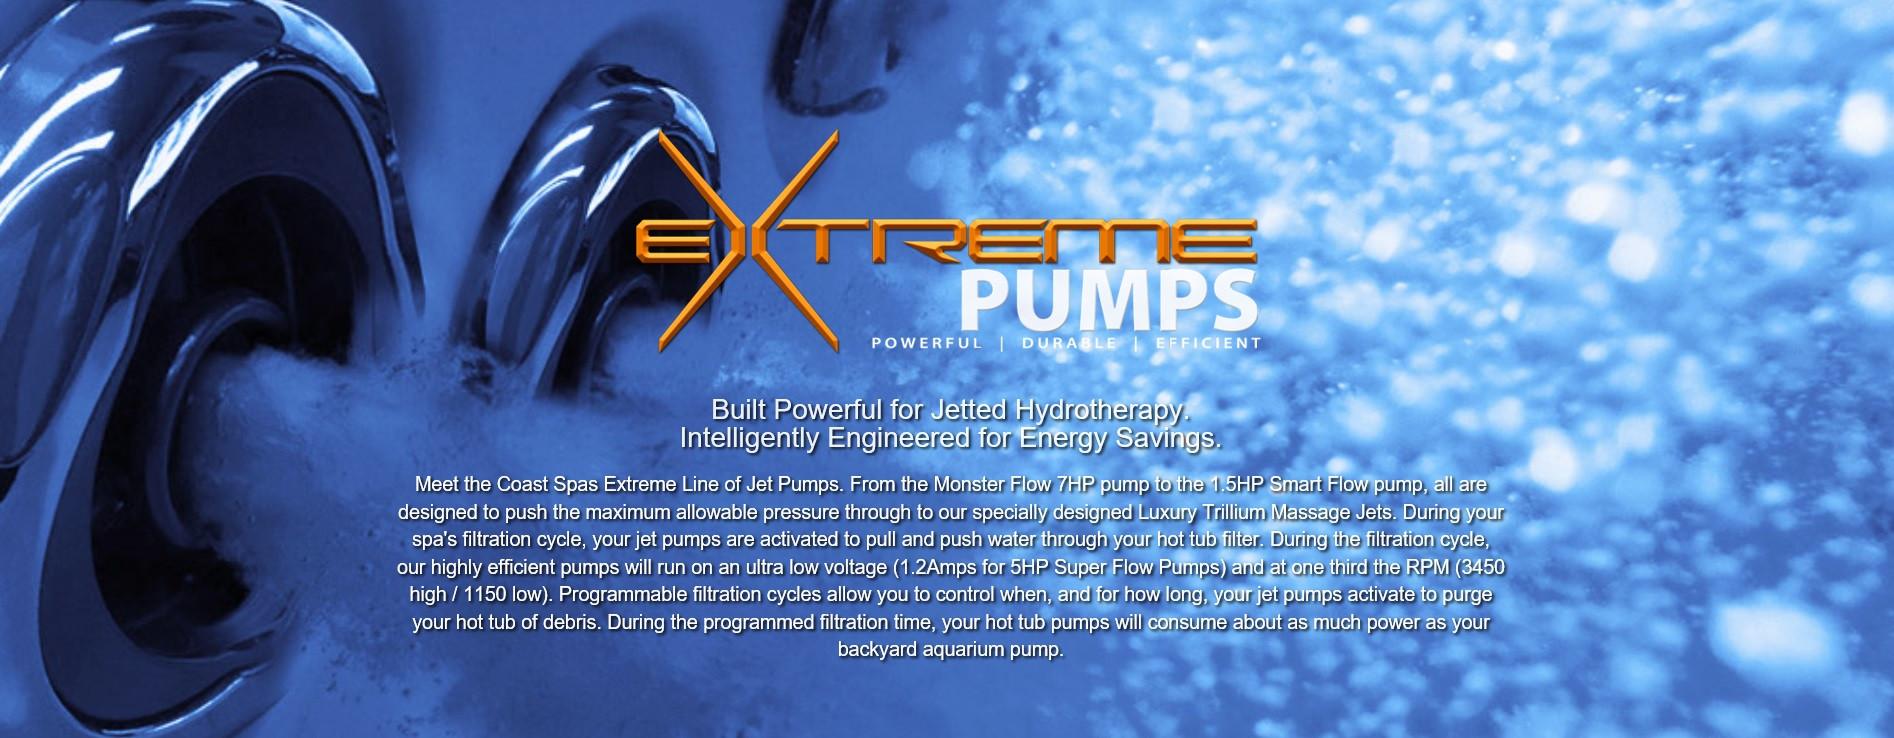 eXtreme Pumps.jpg